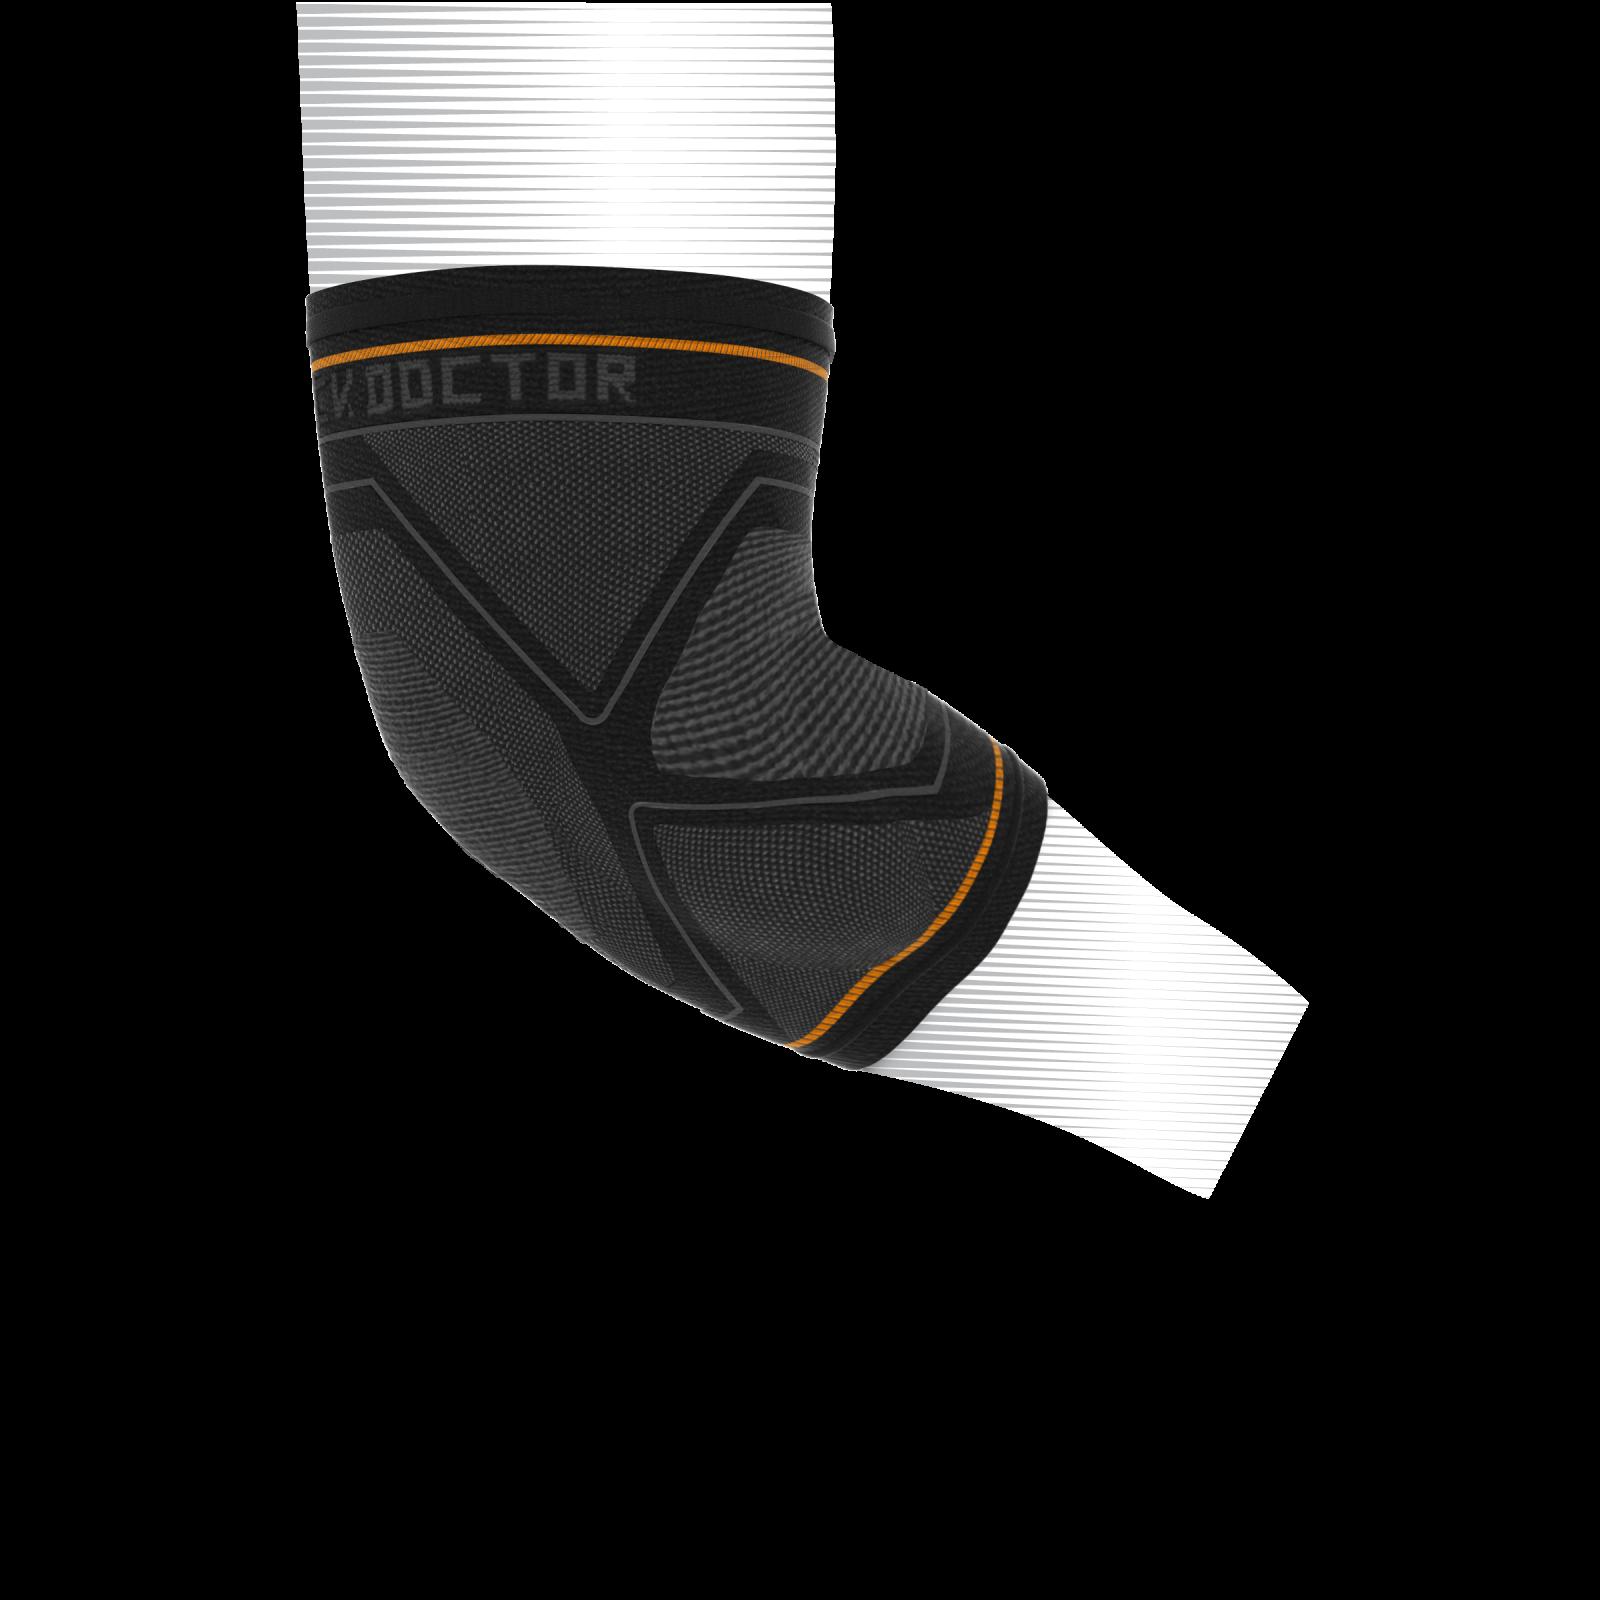 Shock Doctor Compression Knit Ellenbogenmanschette mit Gel Support